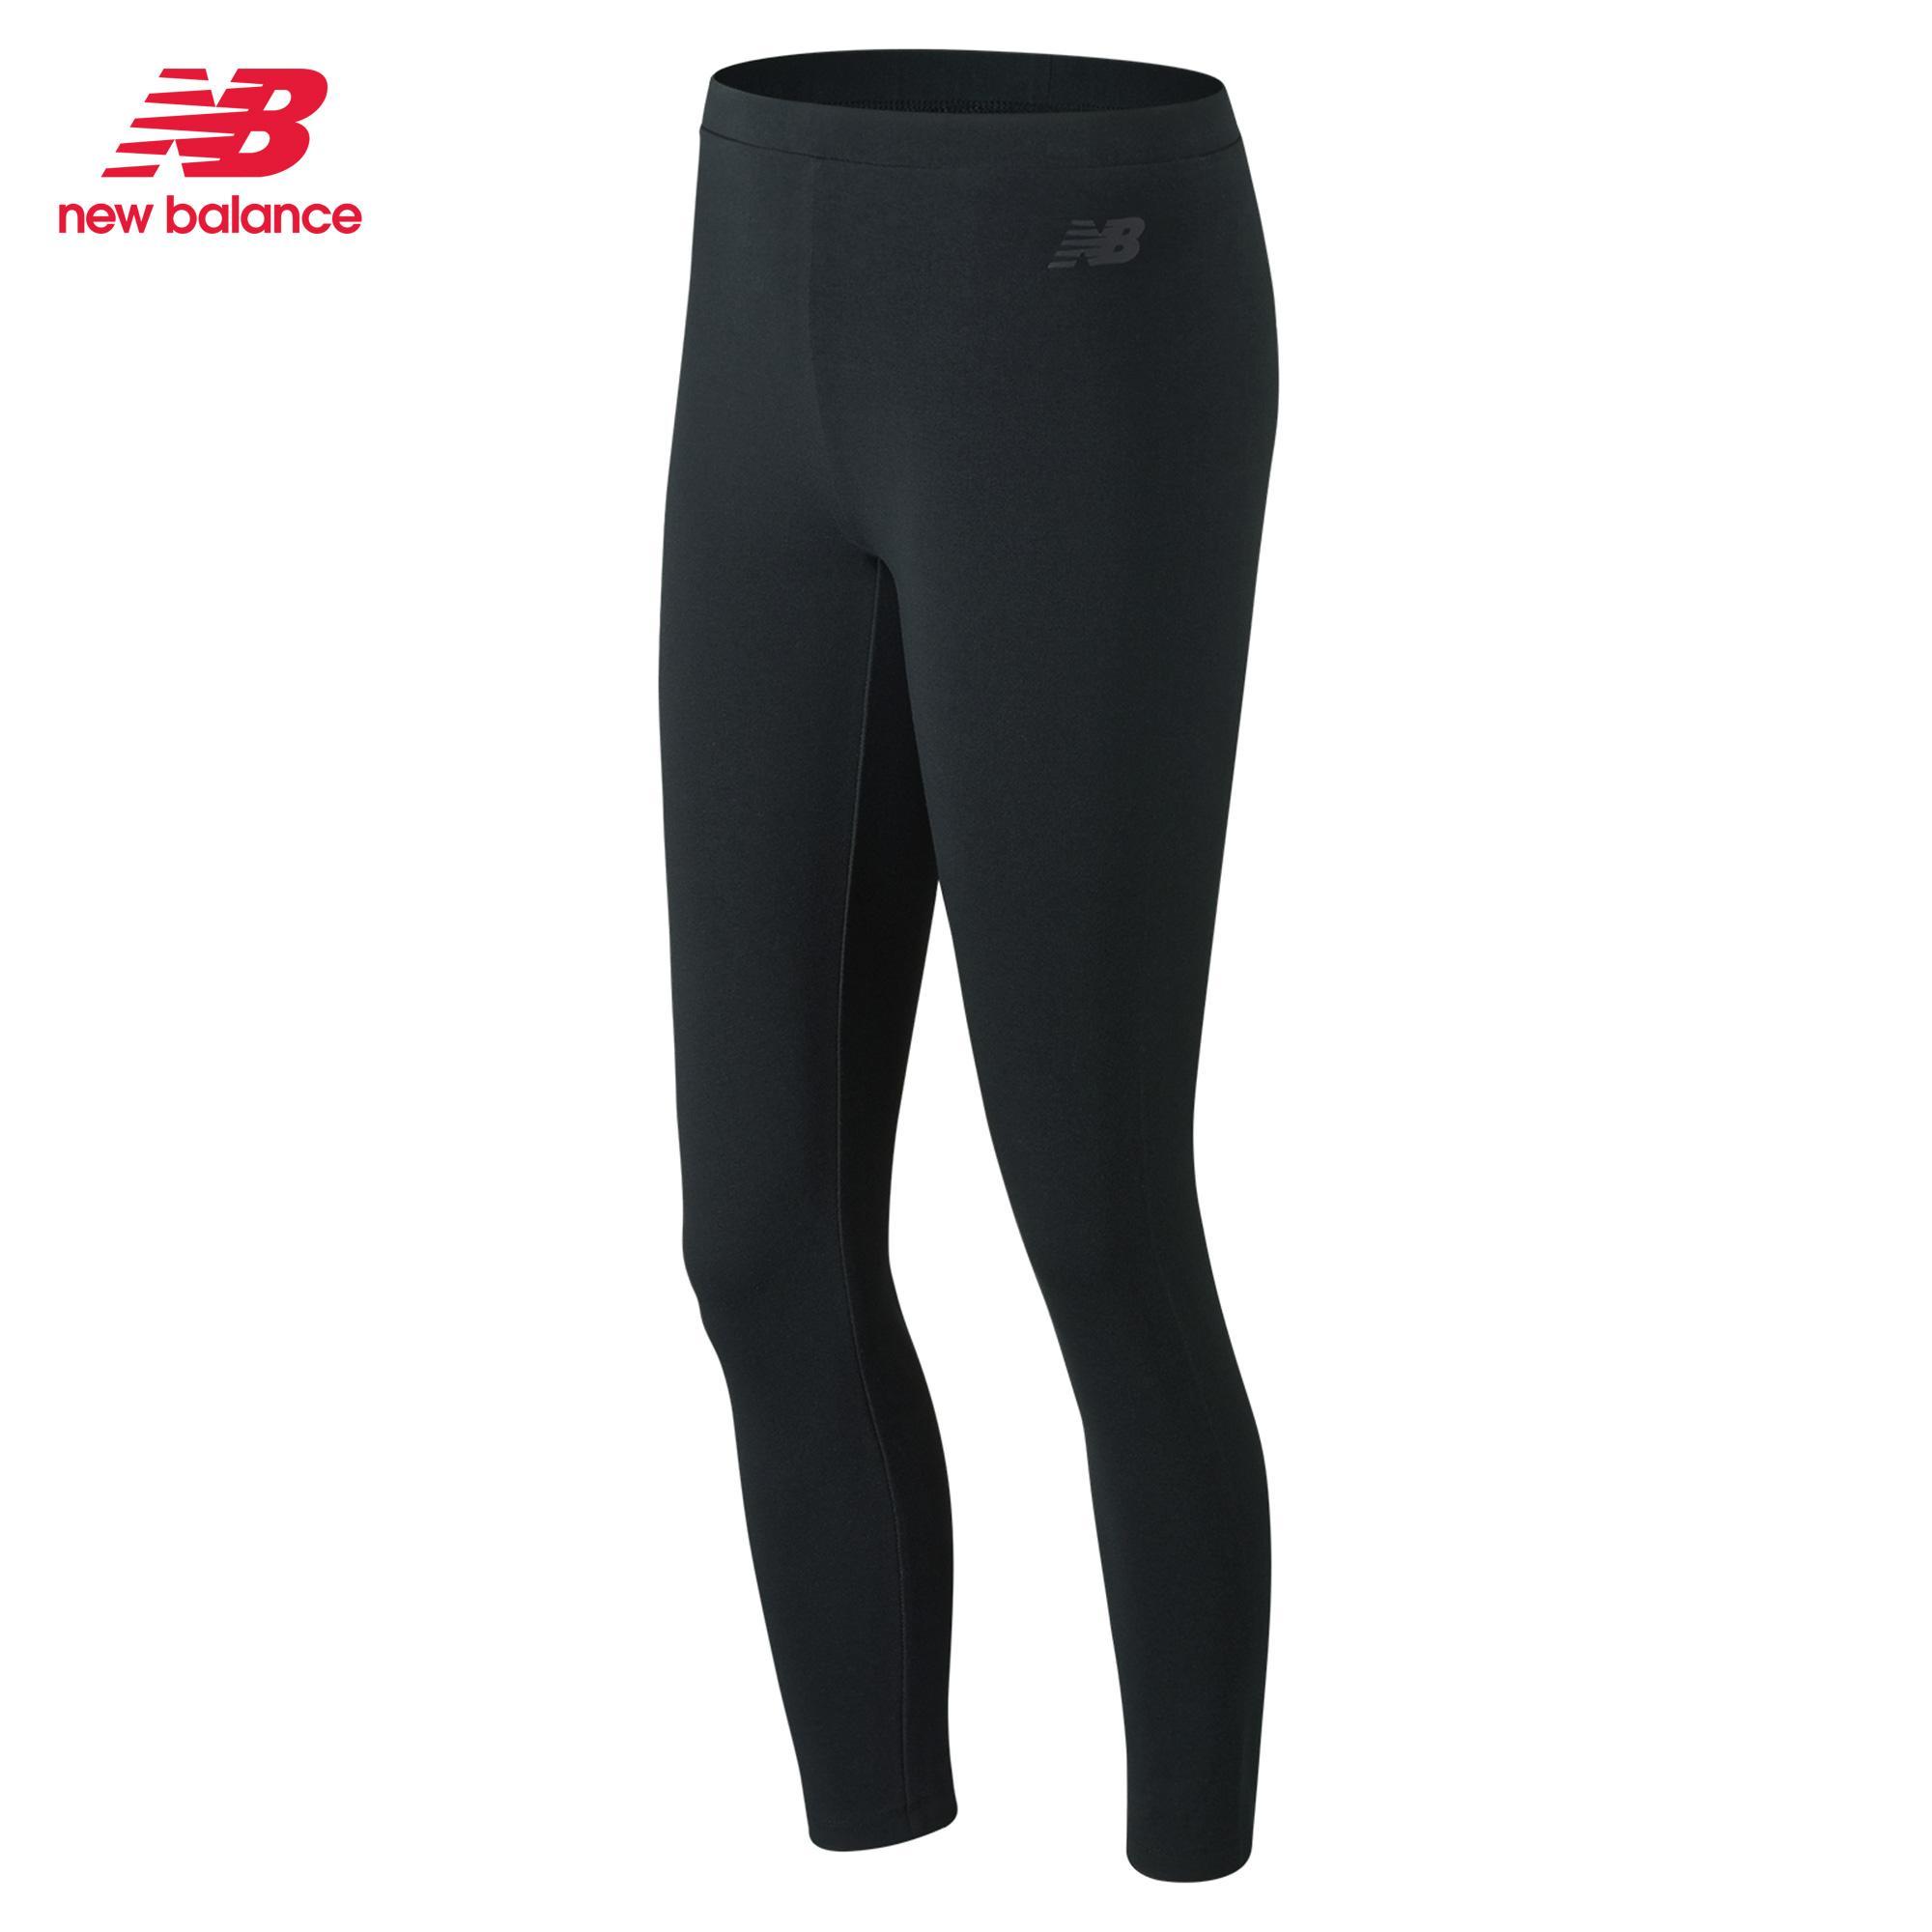 4f7625c9 New Balance Essentials Aqua Camo Leggings Performance Tights for Women ( Black)